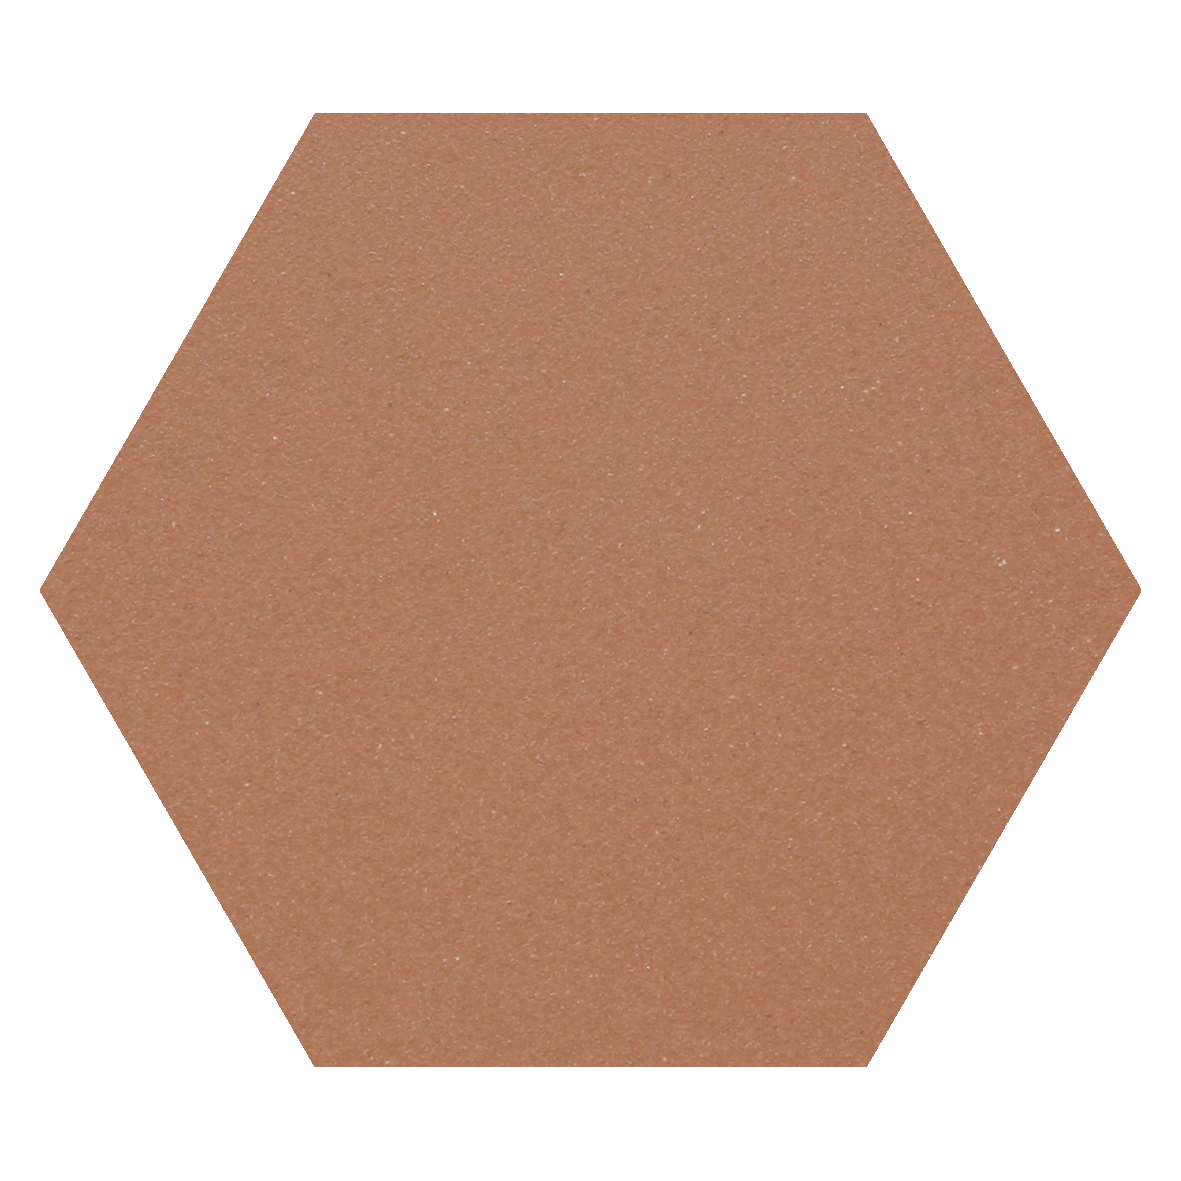 L4404HEX/1C, Natura, Ruskea, lattia,pakkasenkesto,uimahalli,design_from_finland